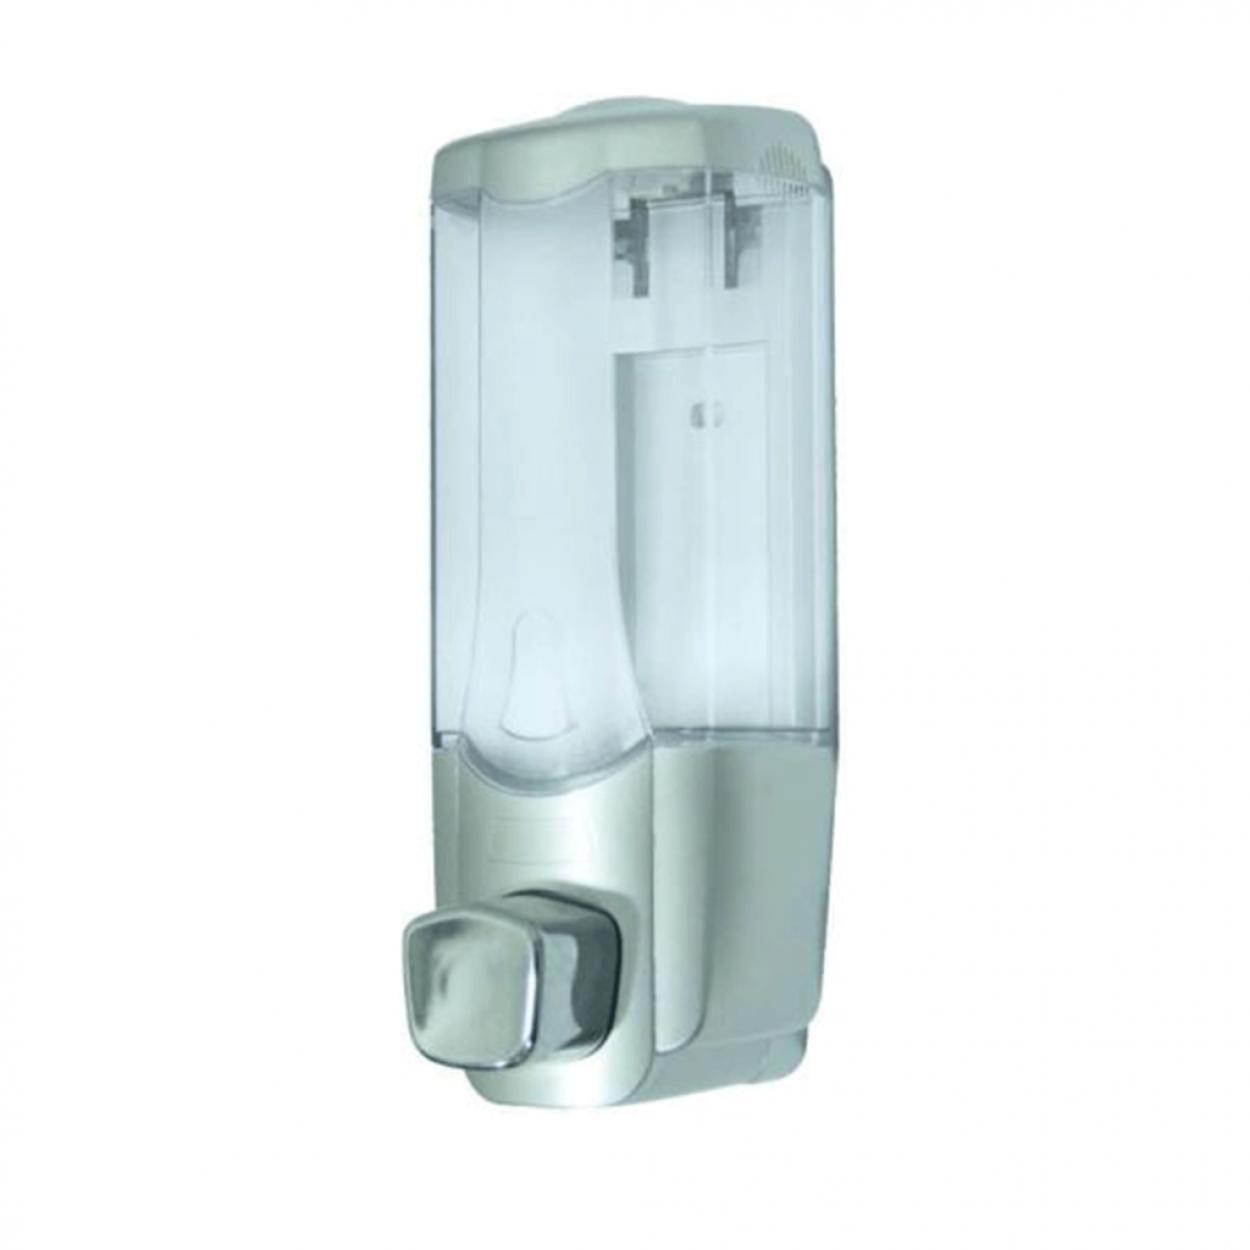 ABS Silver Sıvı Sabunluk 380ml